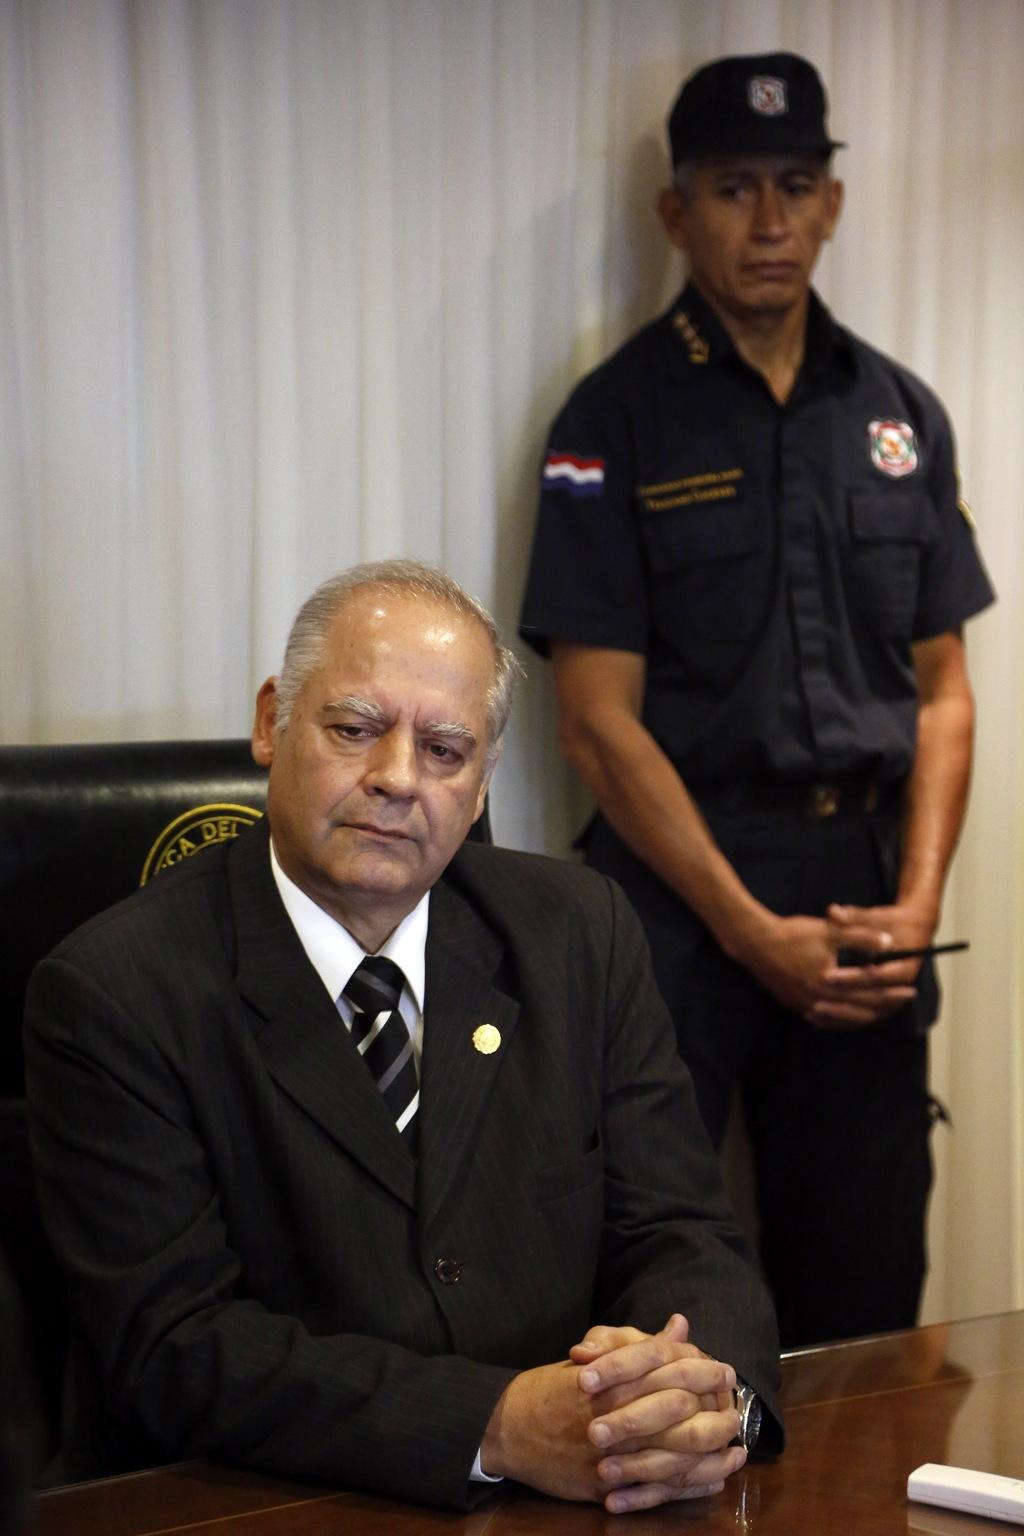 Paraguay's Supreme Court President Luis Benitez Riera listens to a senator during a meeting with Senate President Robert Acevedo in Asu